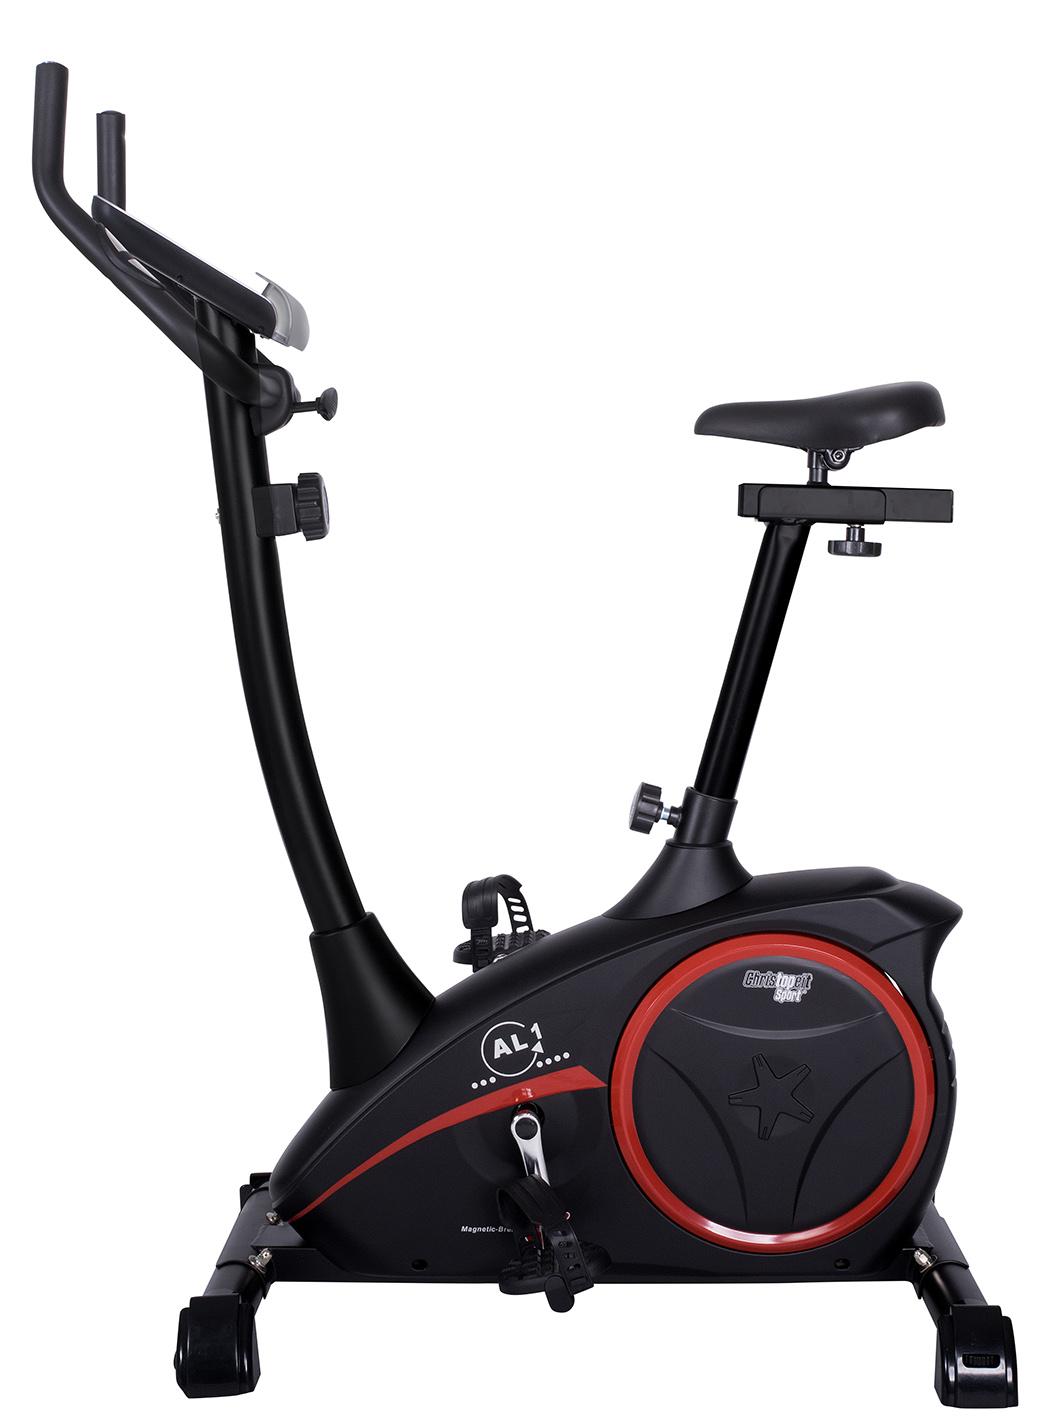 CHRISTOPEIT SPORT velotrenazieris AL1 black TouchSc, 9kg/150kg Trenažieri